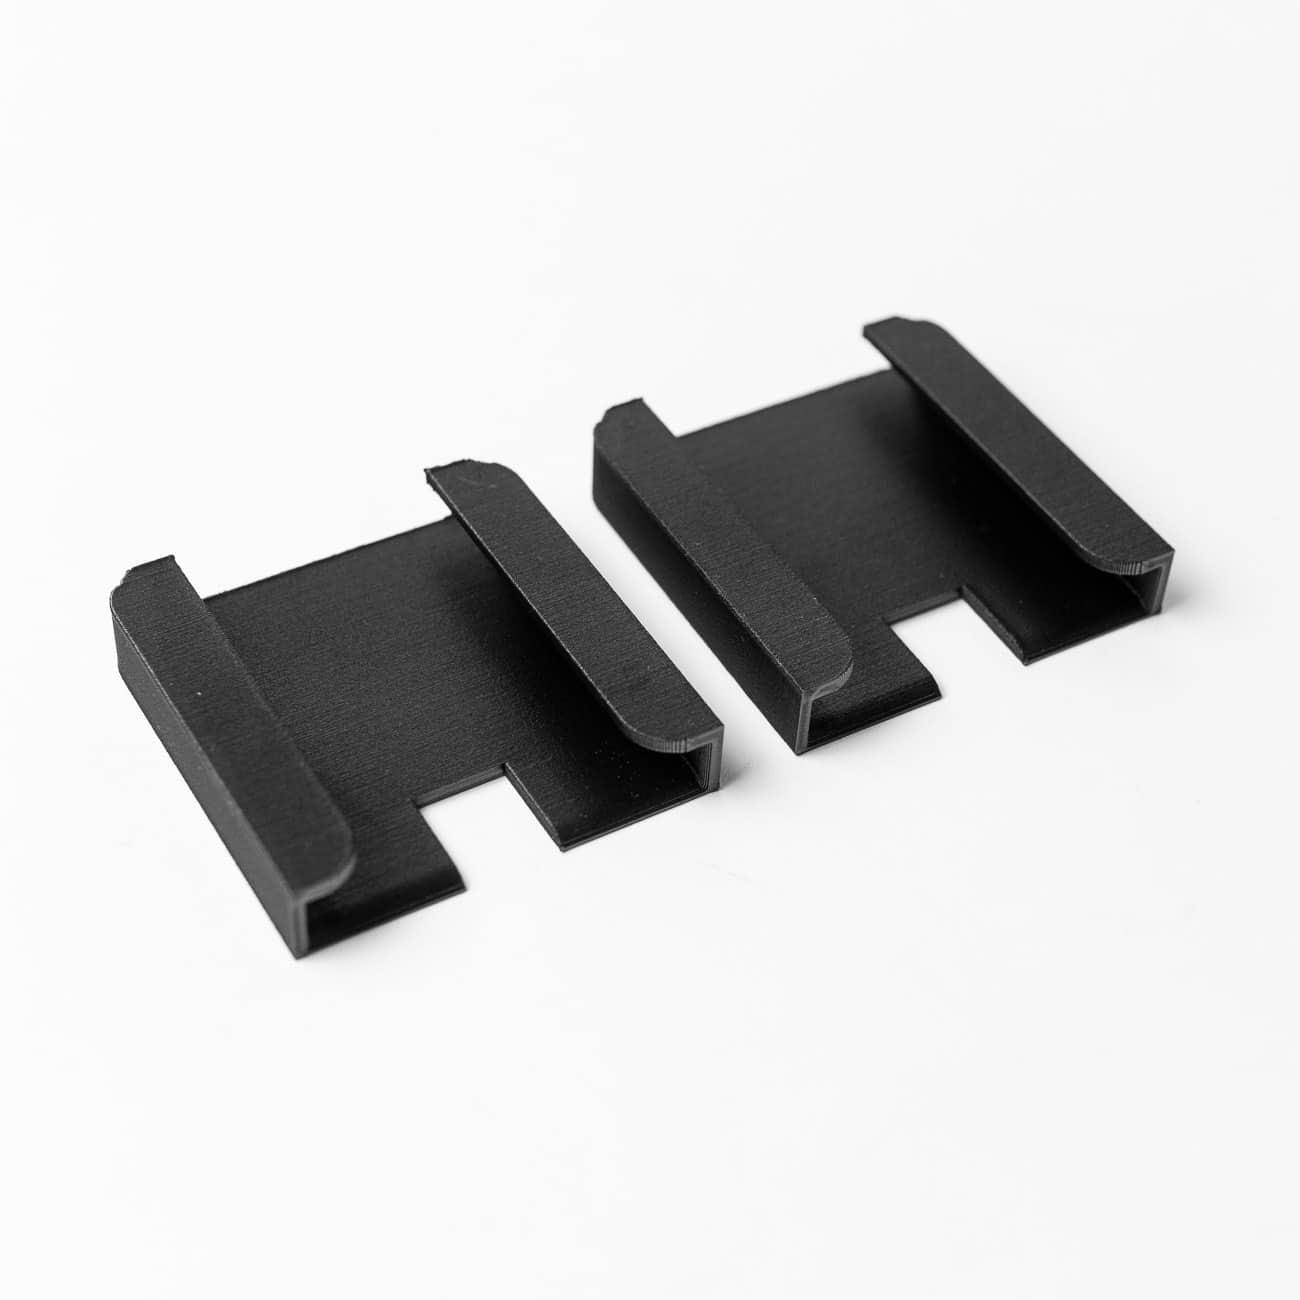 E46 / M3 Bumper Bracket Replacement